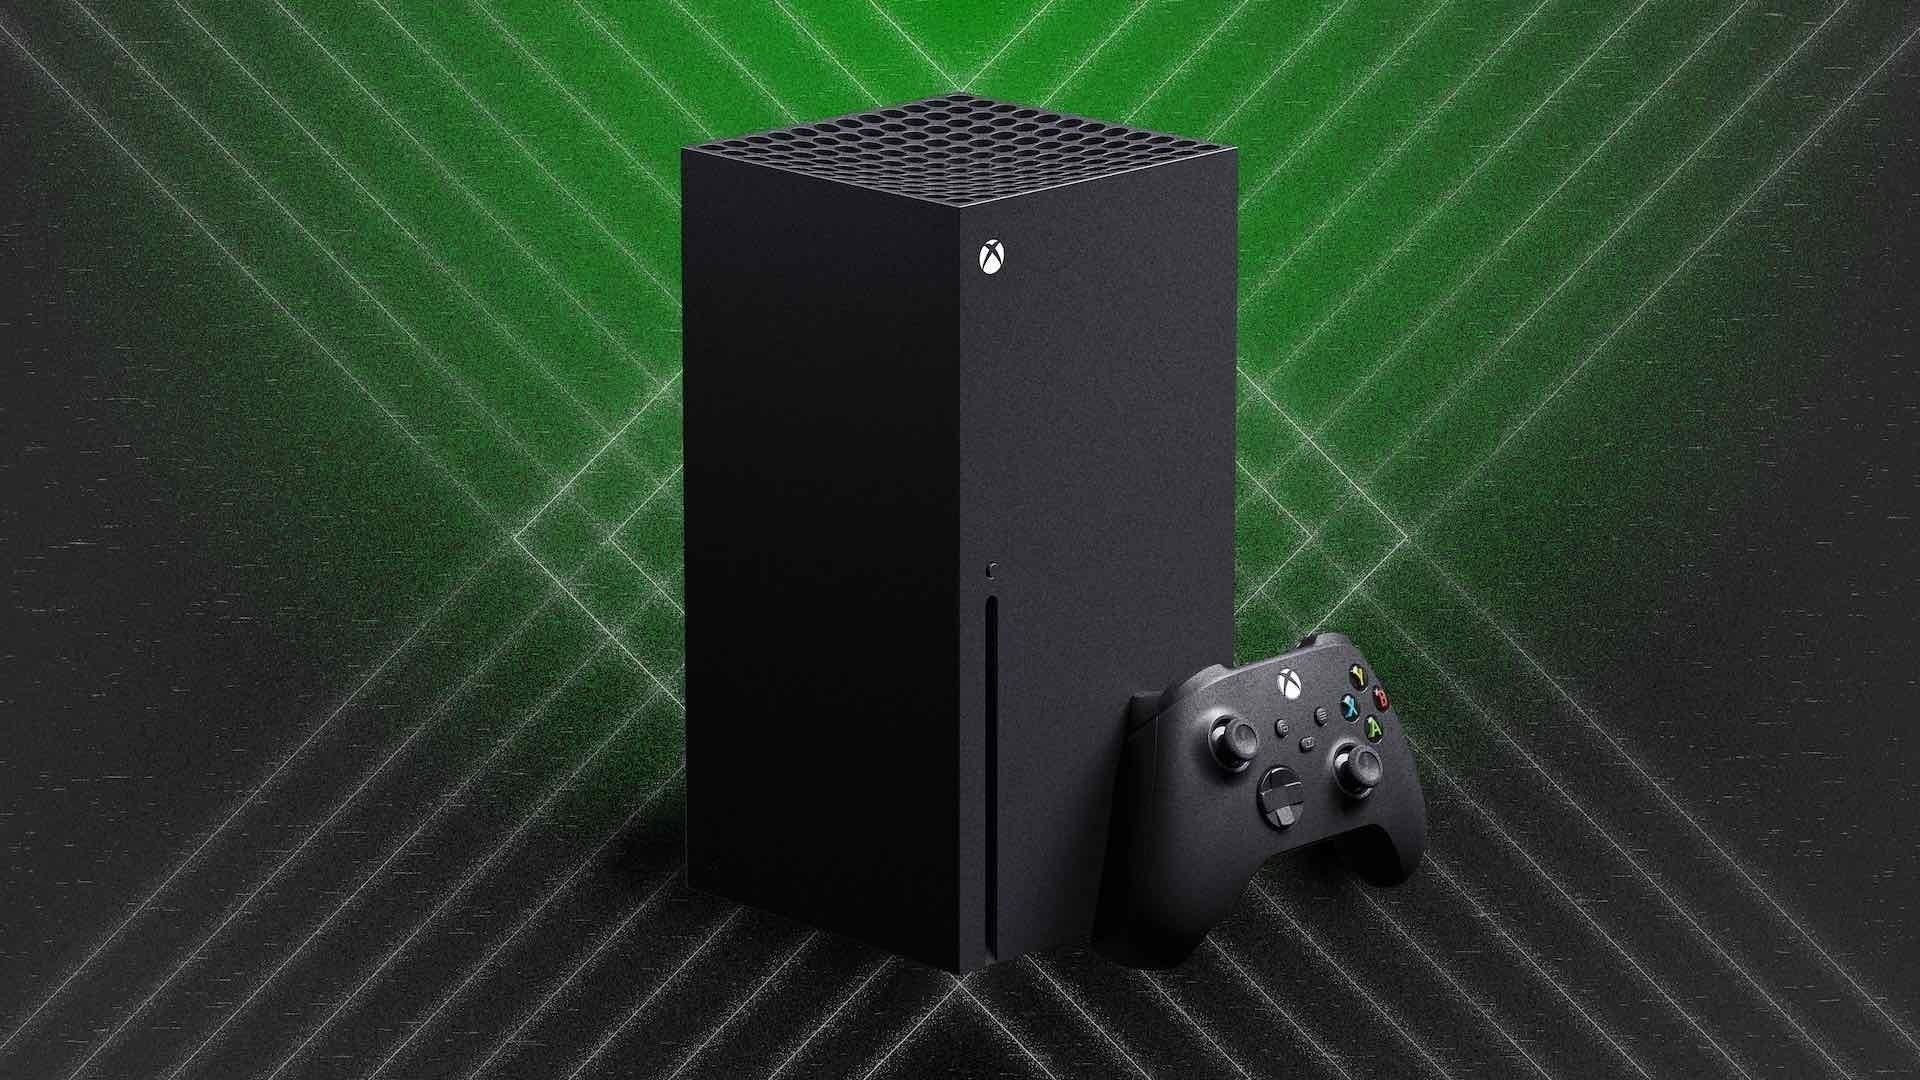 Xbox Series PC Wallpaper HD